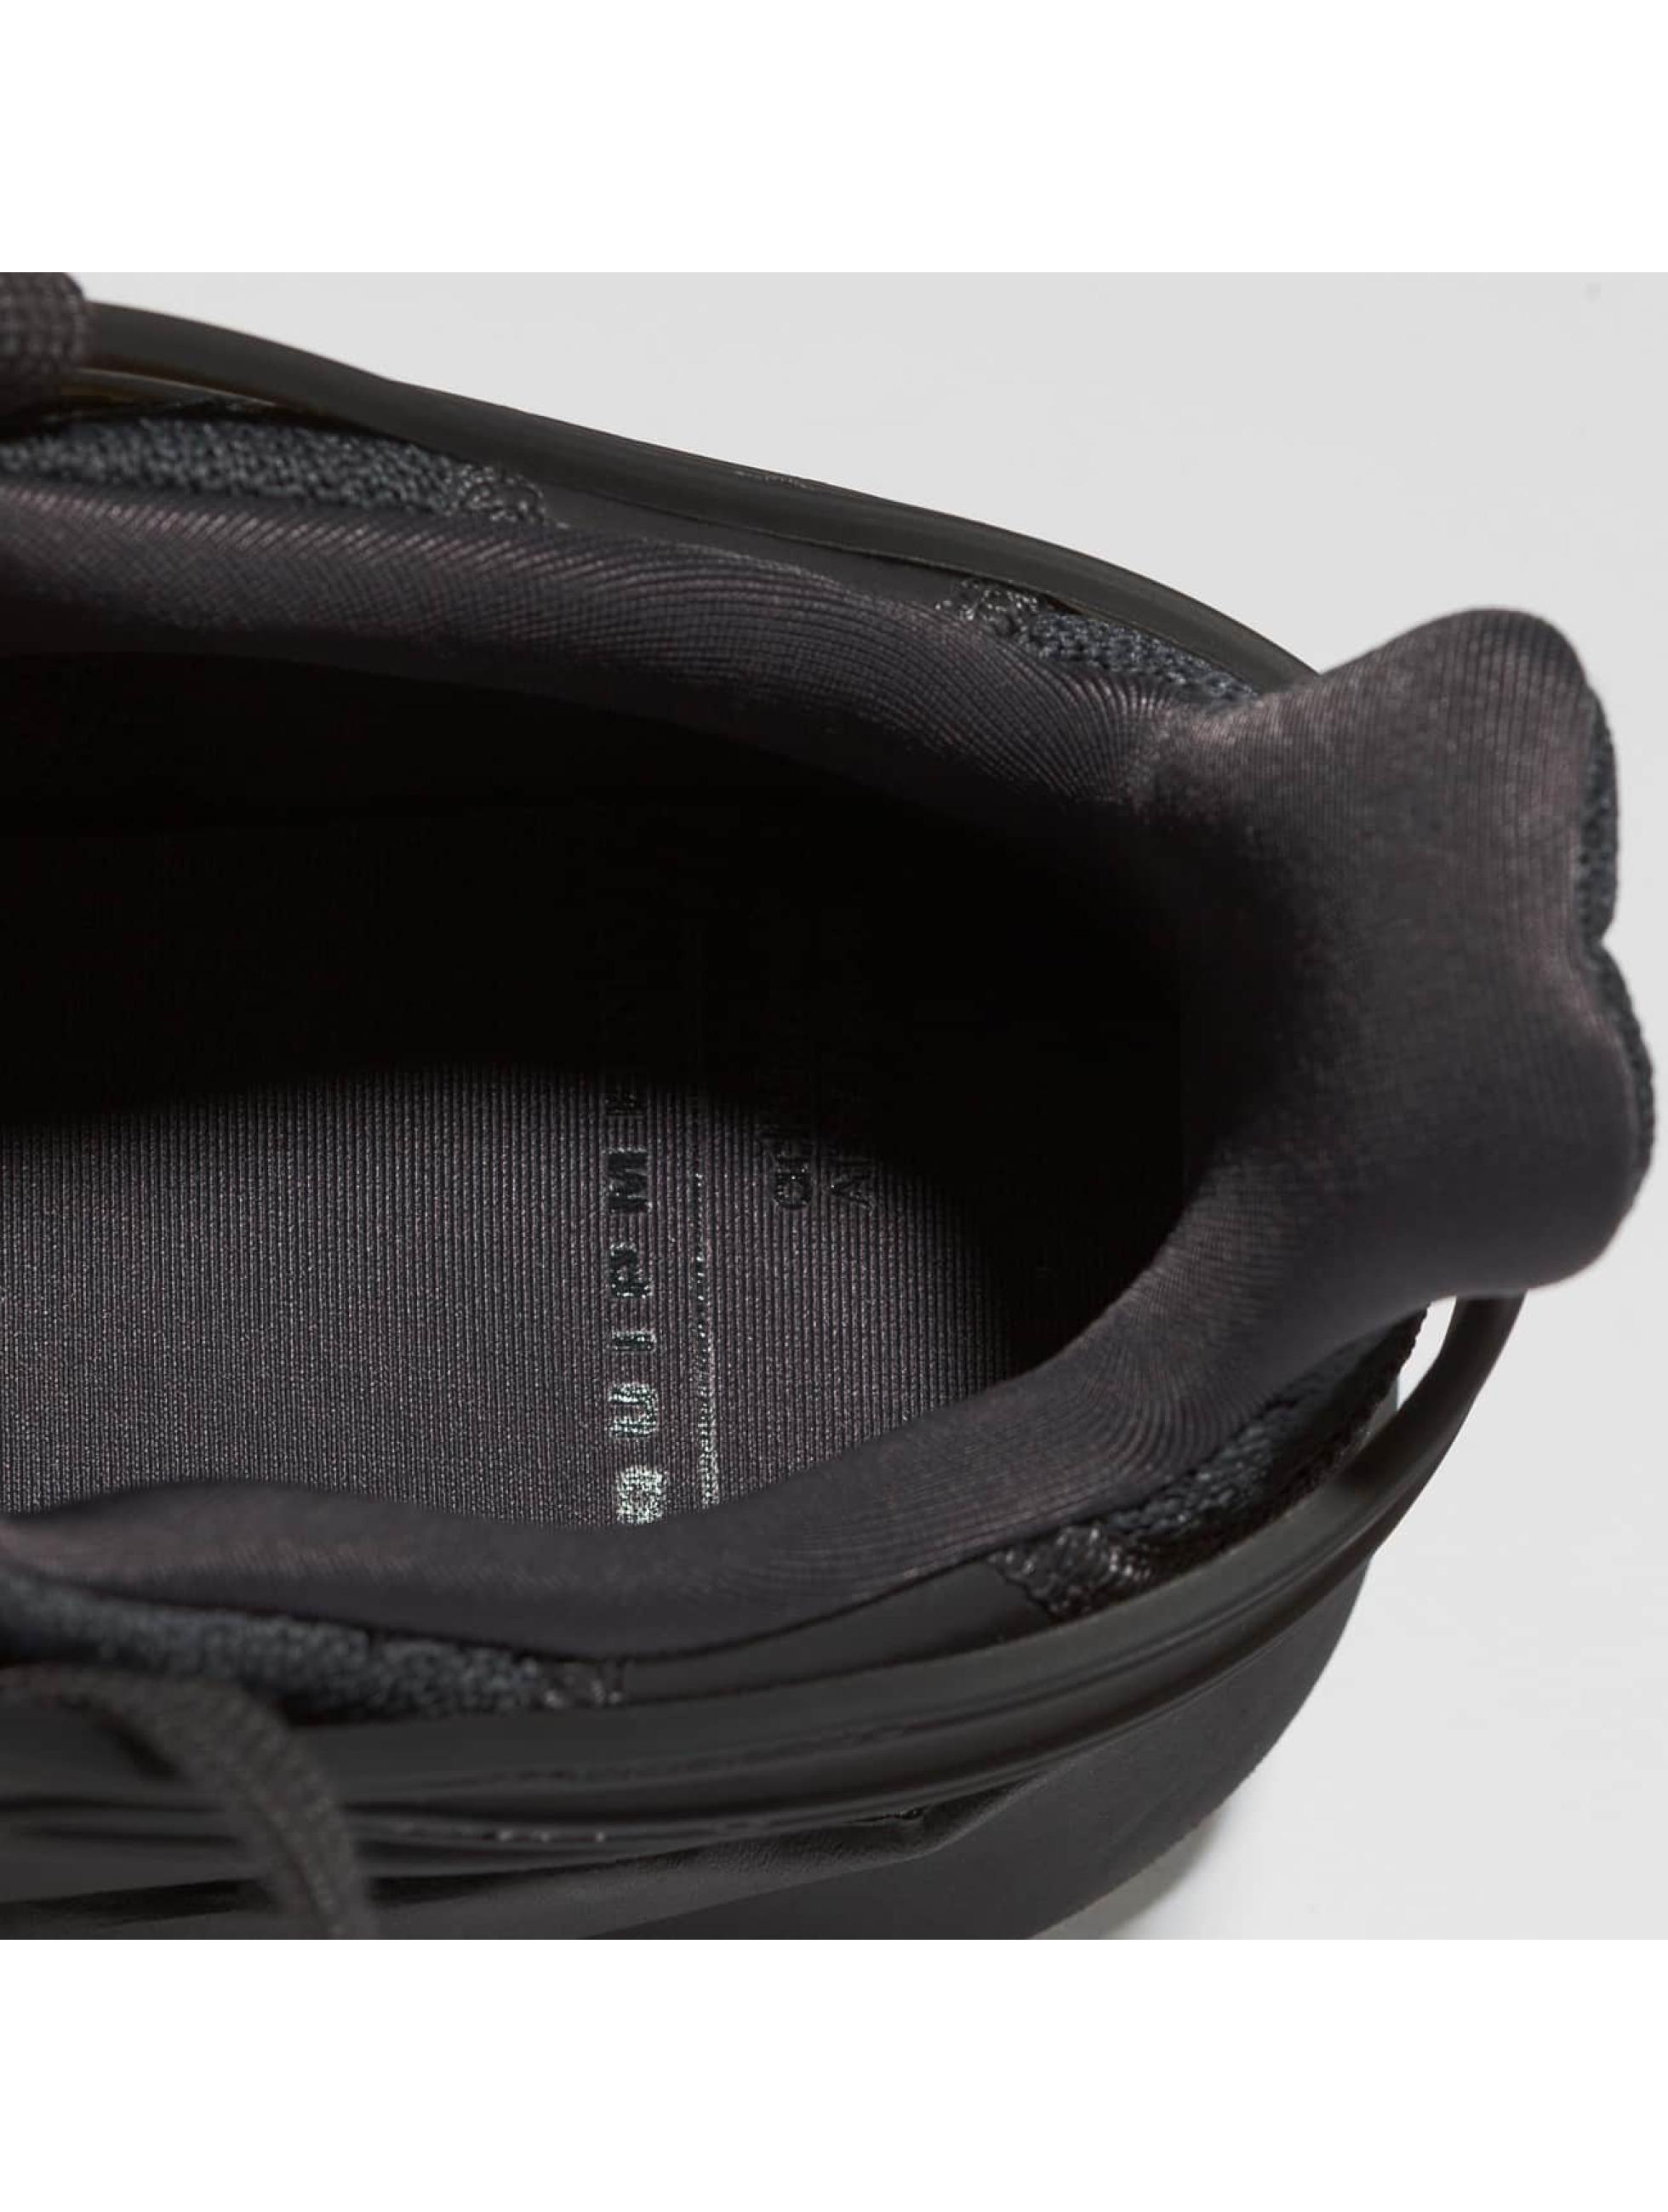 adidas originals Tennarit EQT Support ADV musta